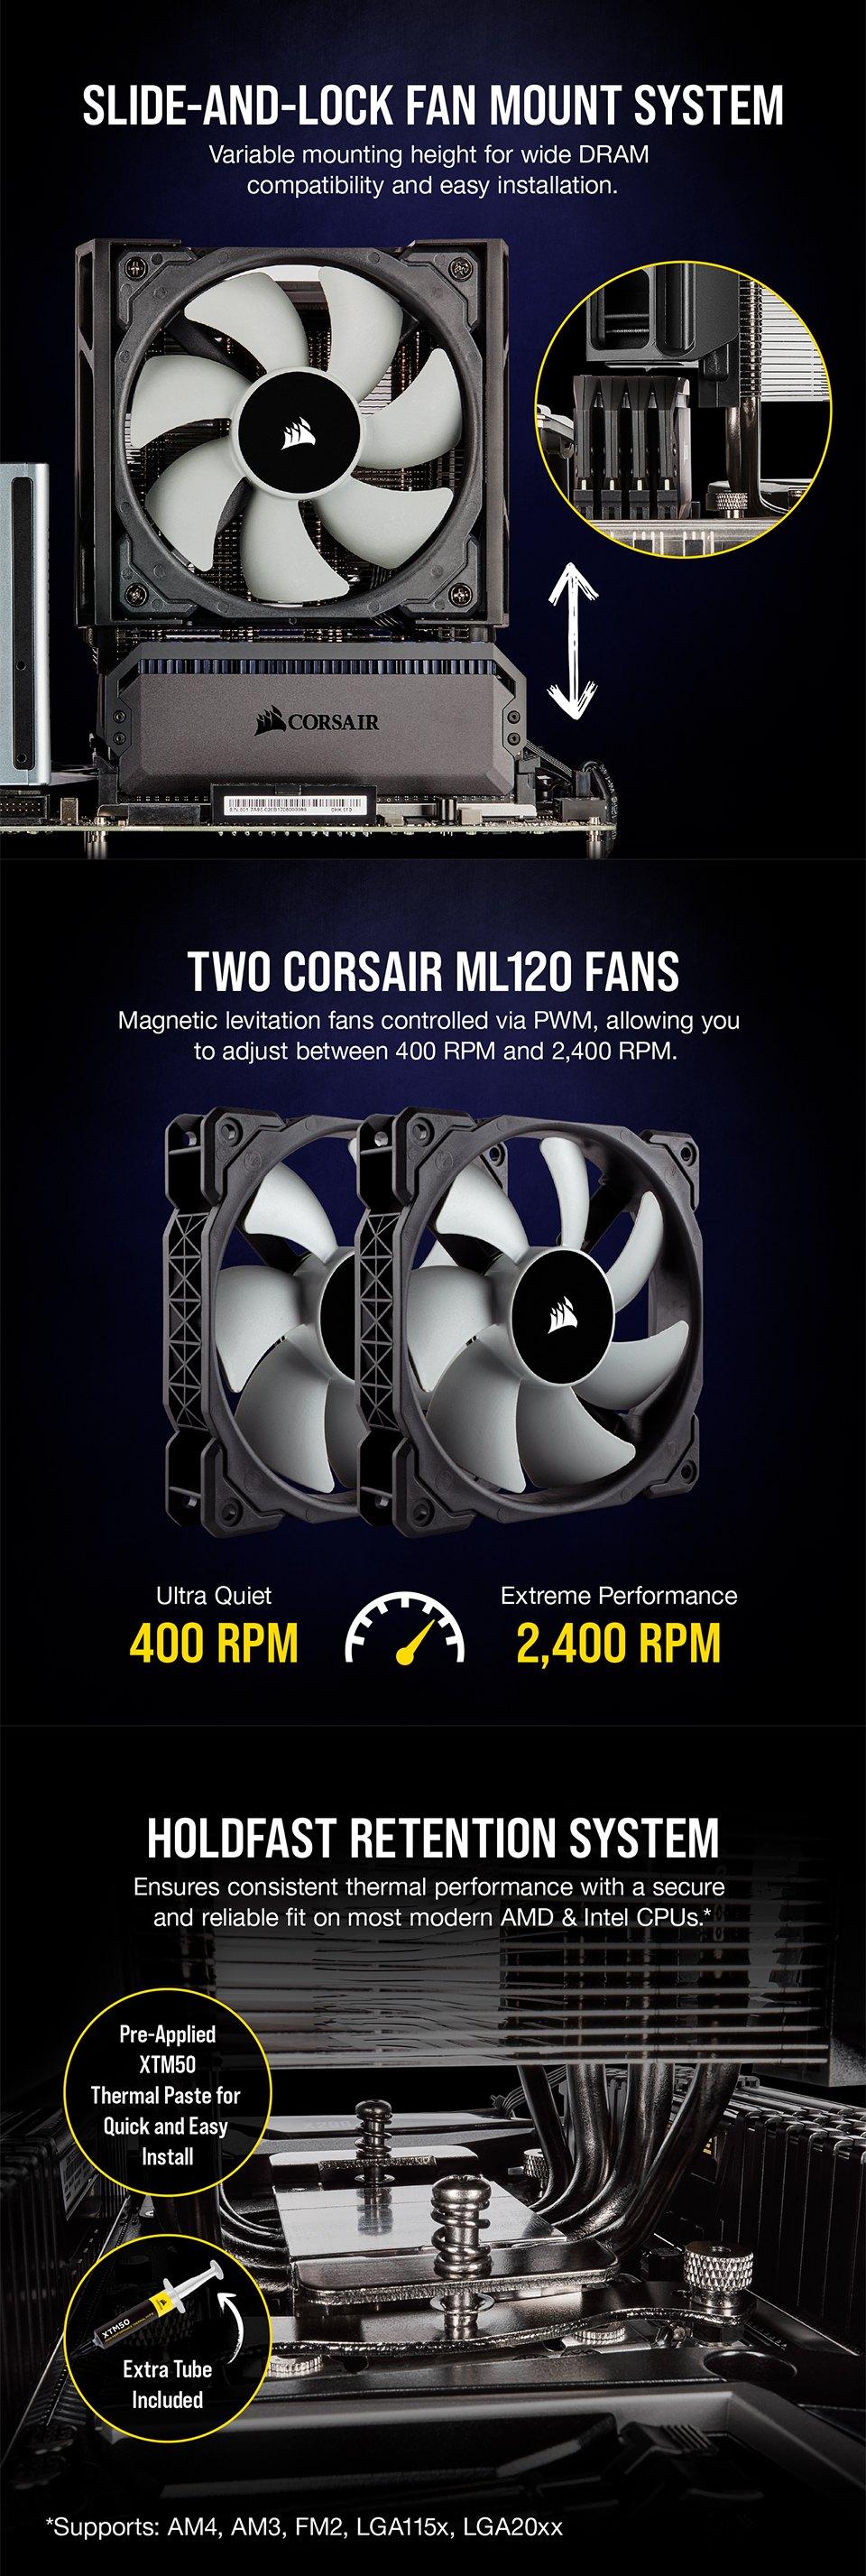 Corsair A500 High Performance Dual Fan CPU Cooler features 2